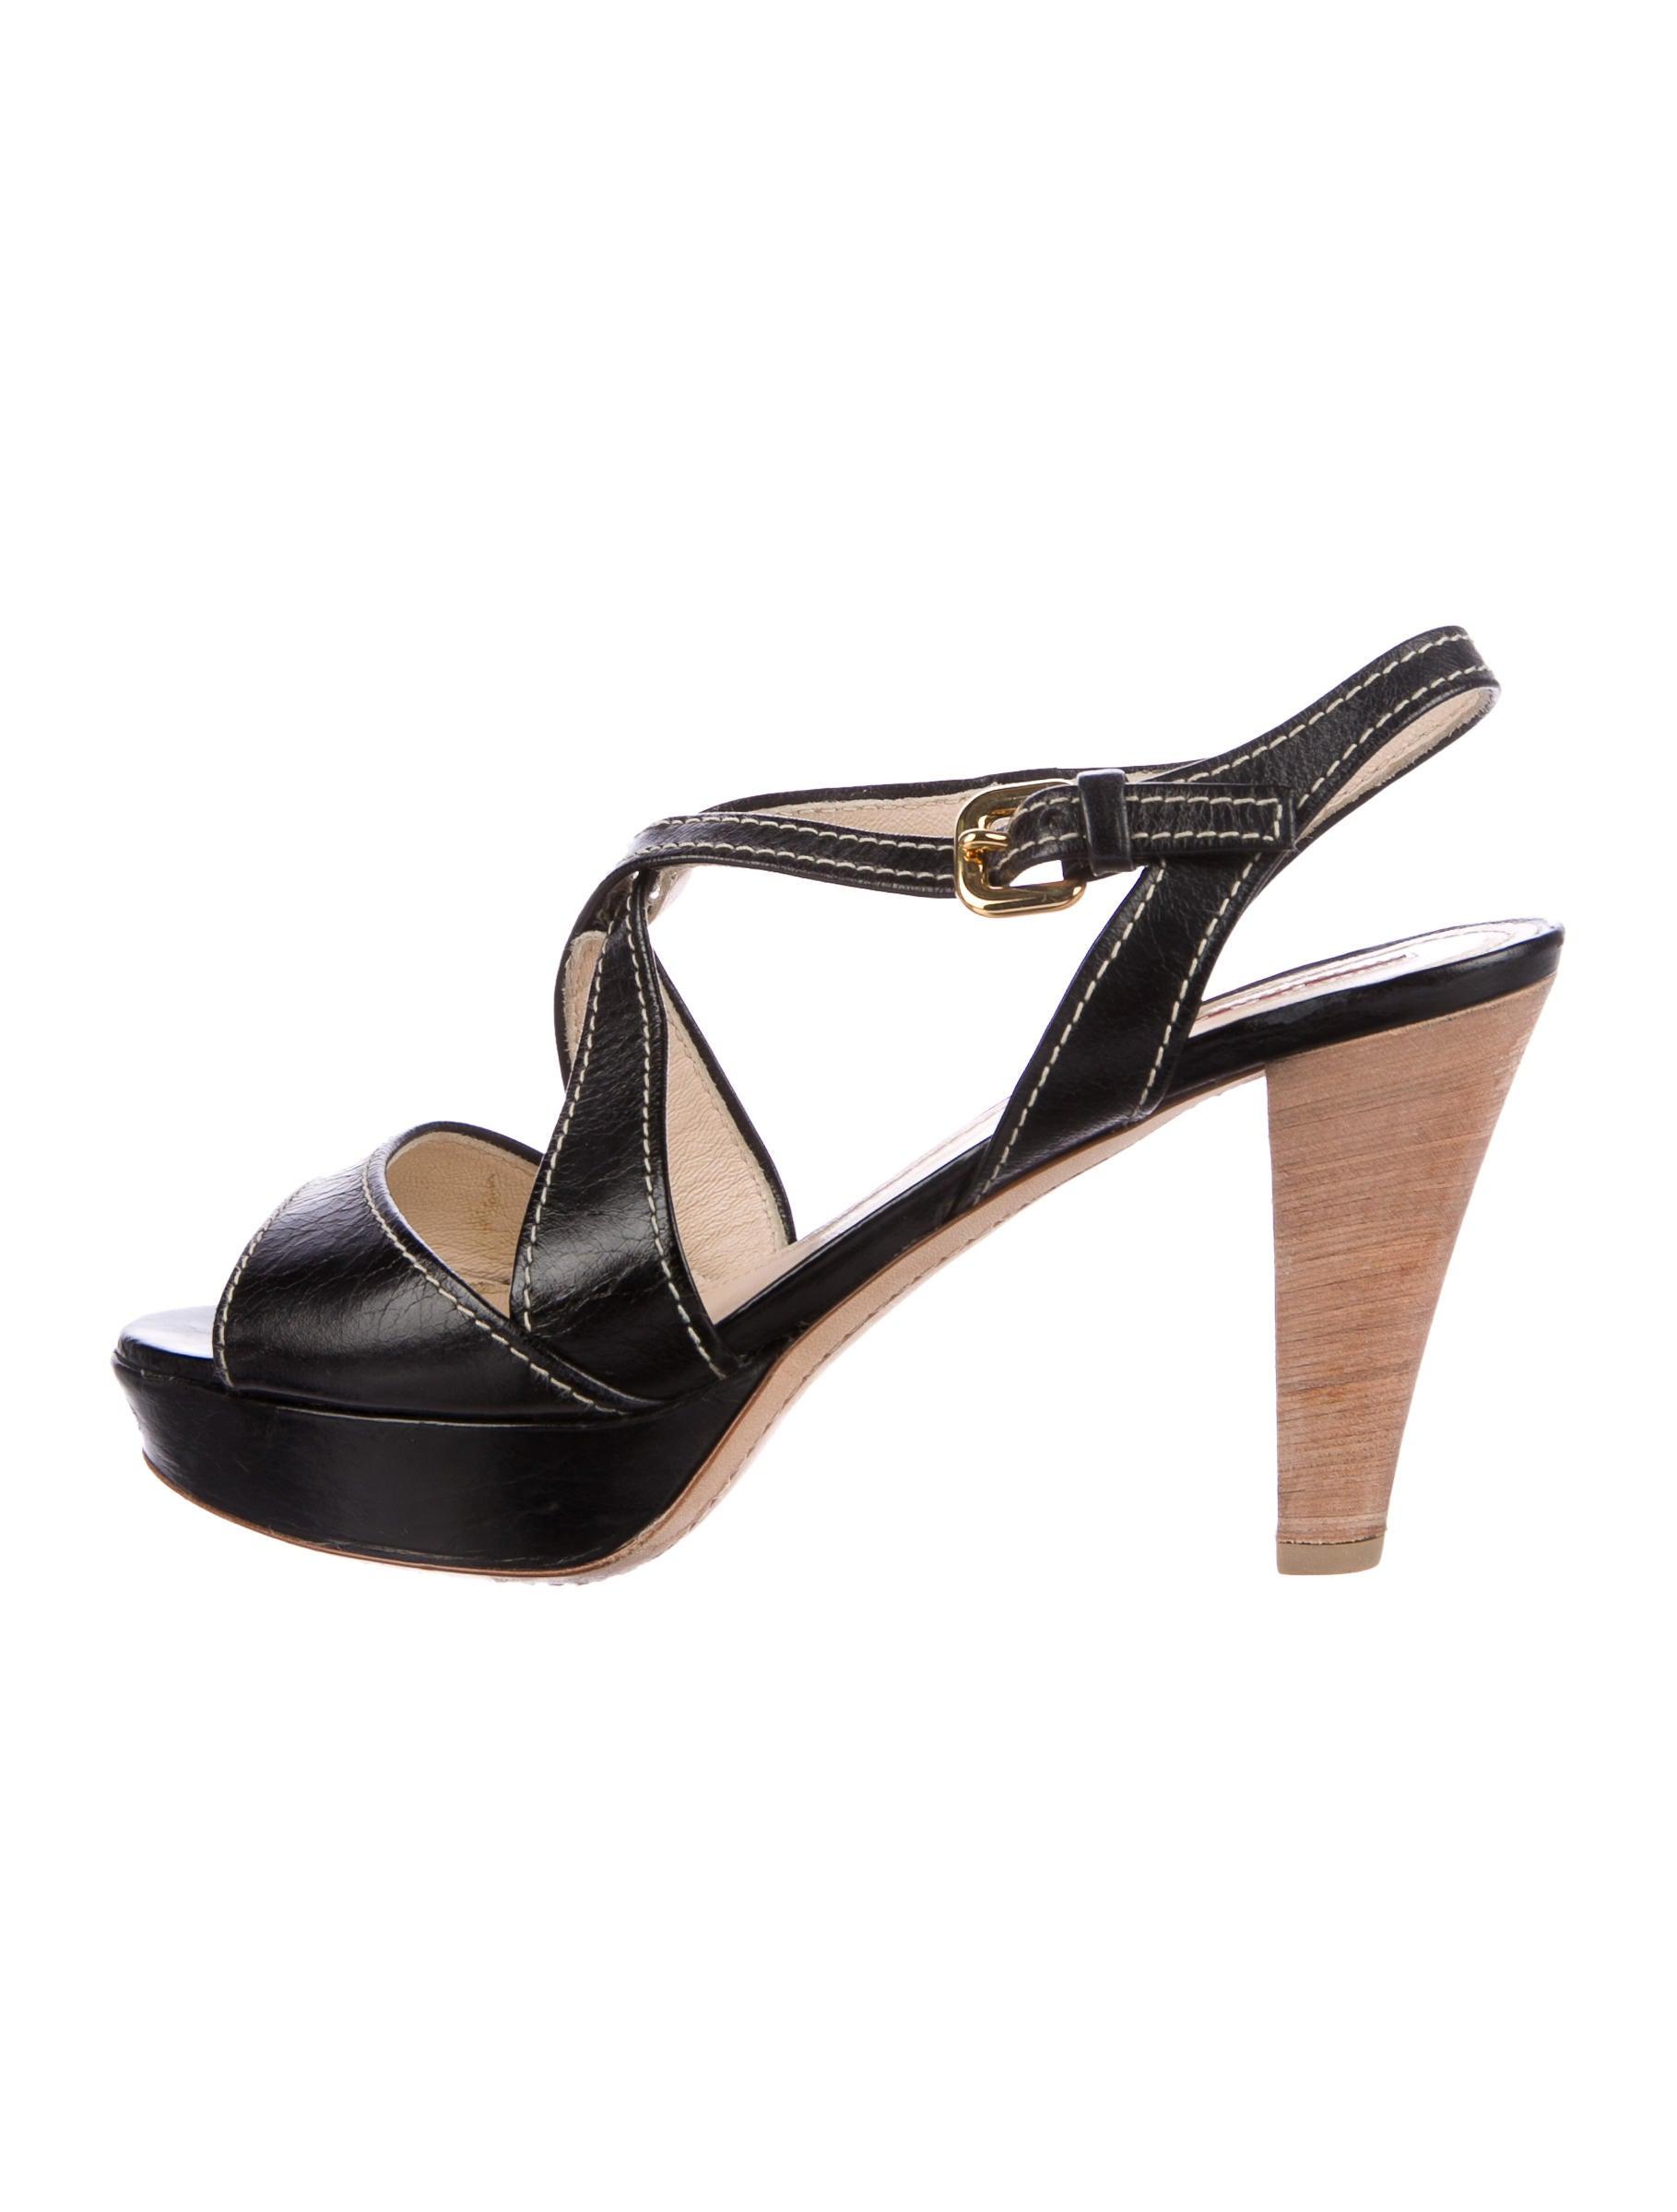 Prada Sport Leather Slingback Sandals explore cheap cost 7Ajx1